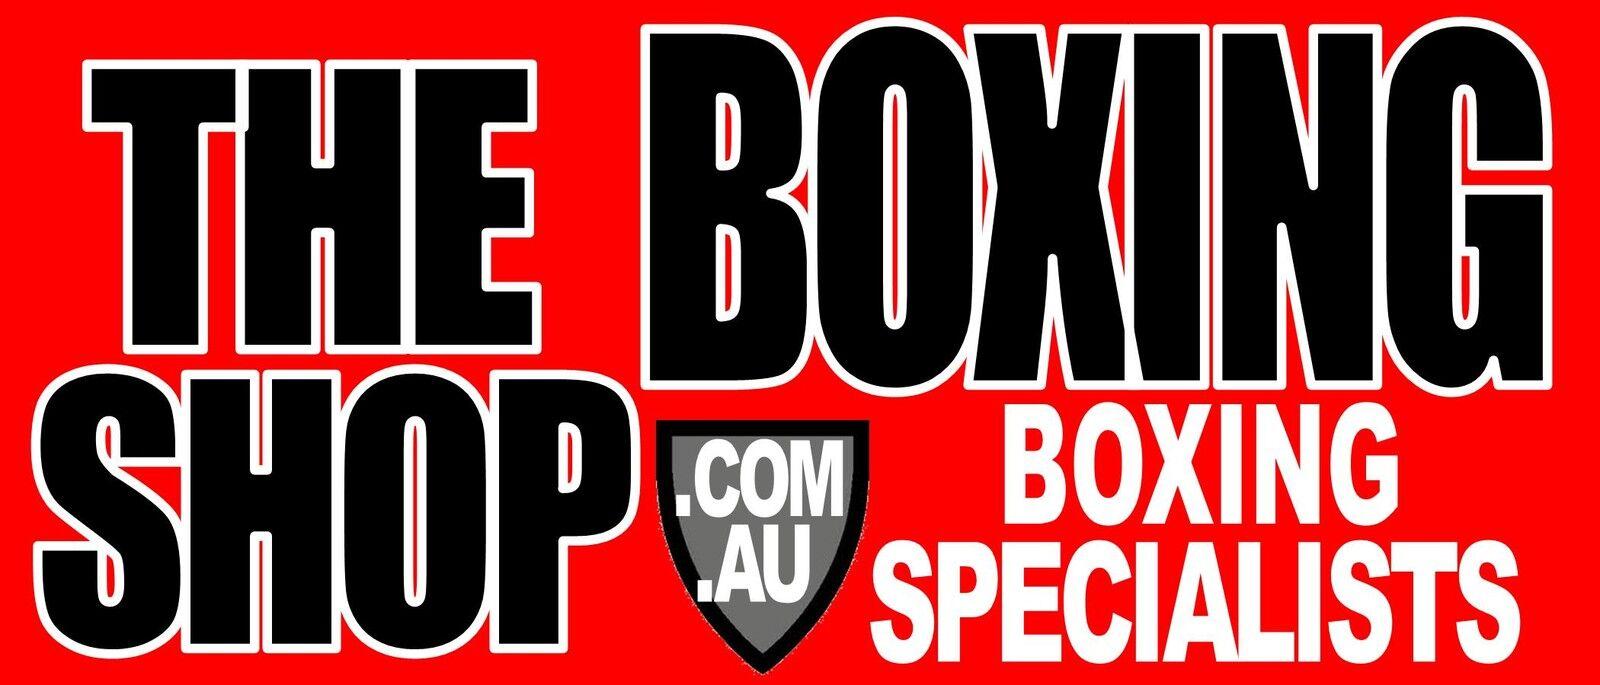 theboxingshop